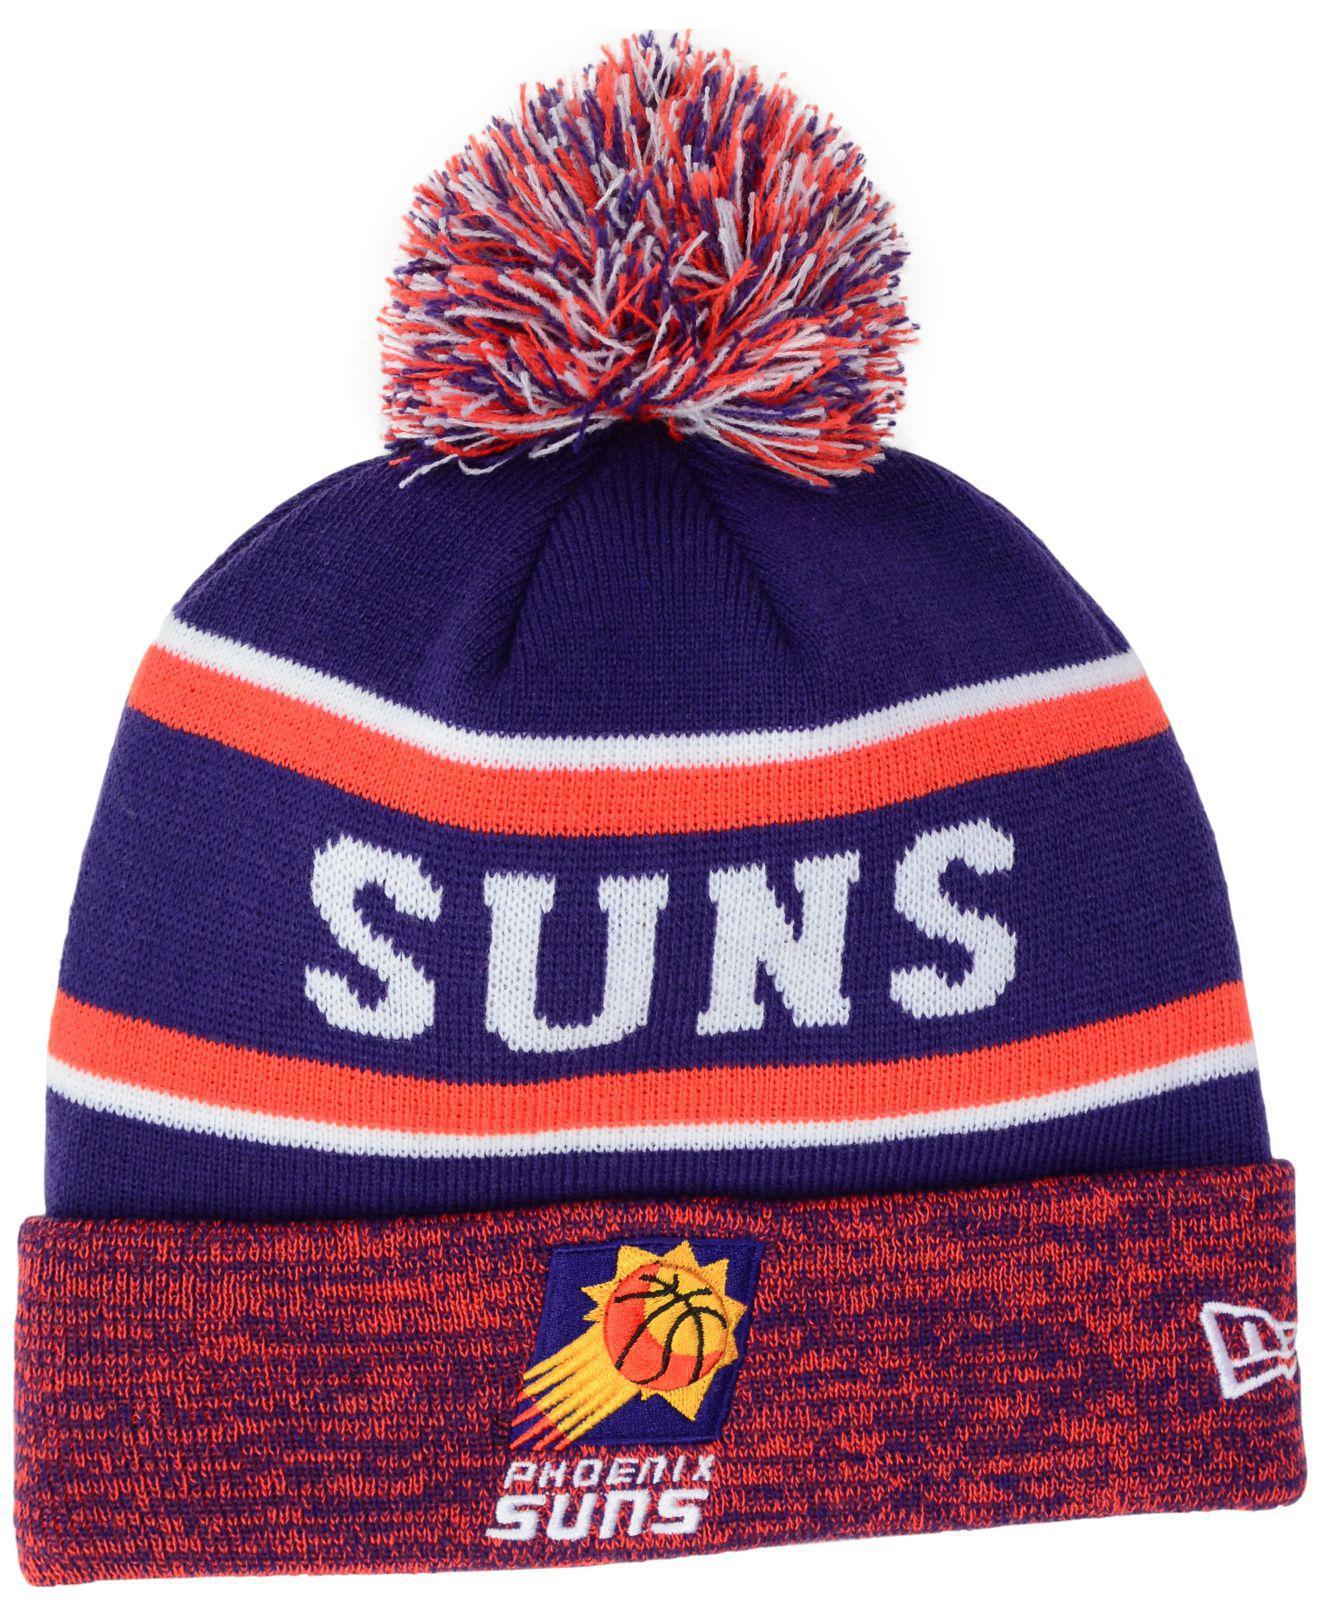 quality design b0a14 7e733 ... sweden low price lyst ktz phoenix suns hwc marled cuff knit a8526 97f0d  8e5ea 3c78e